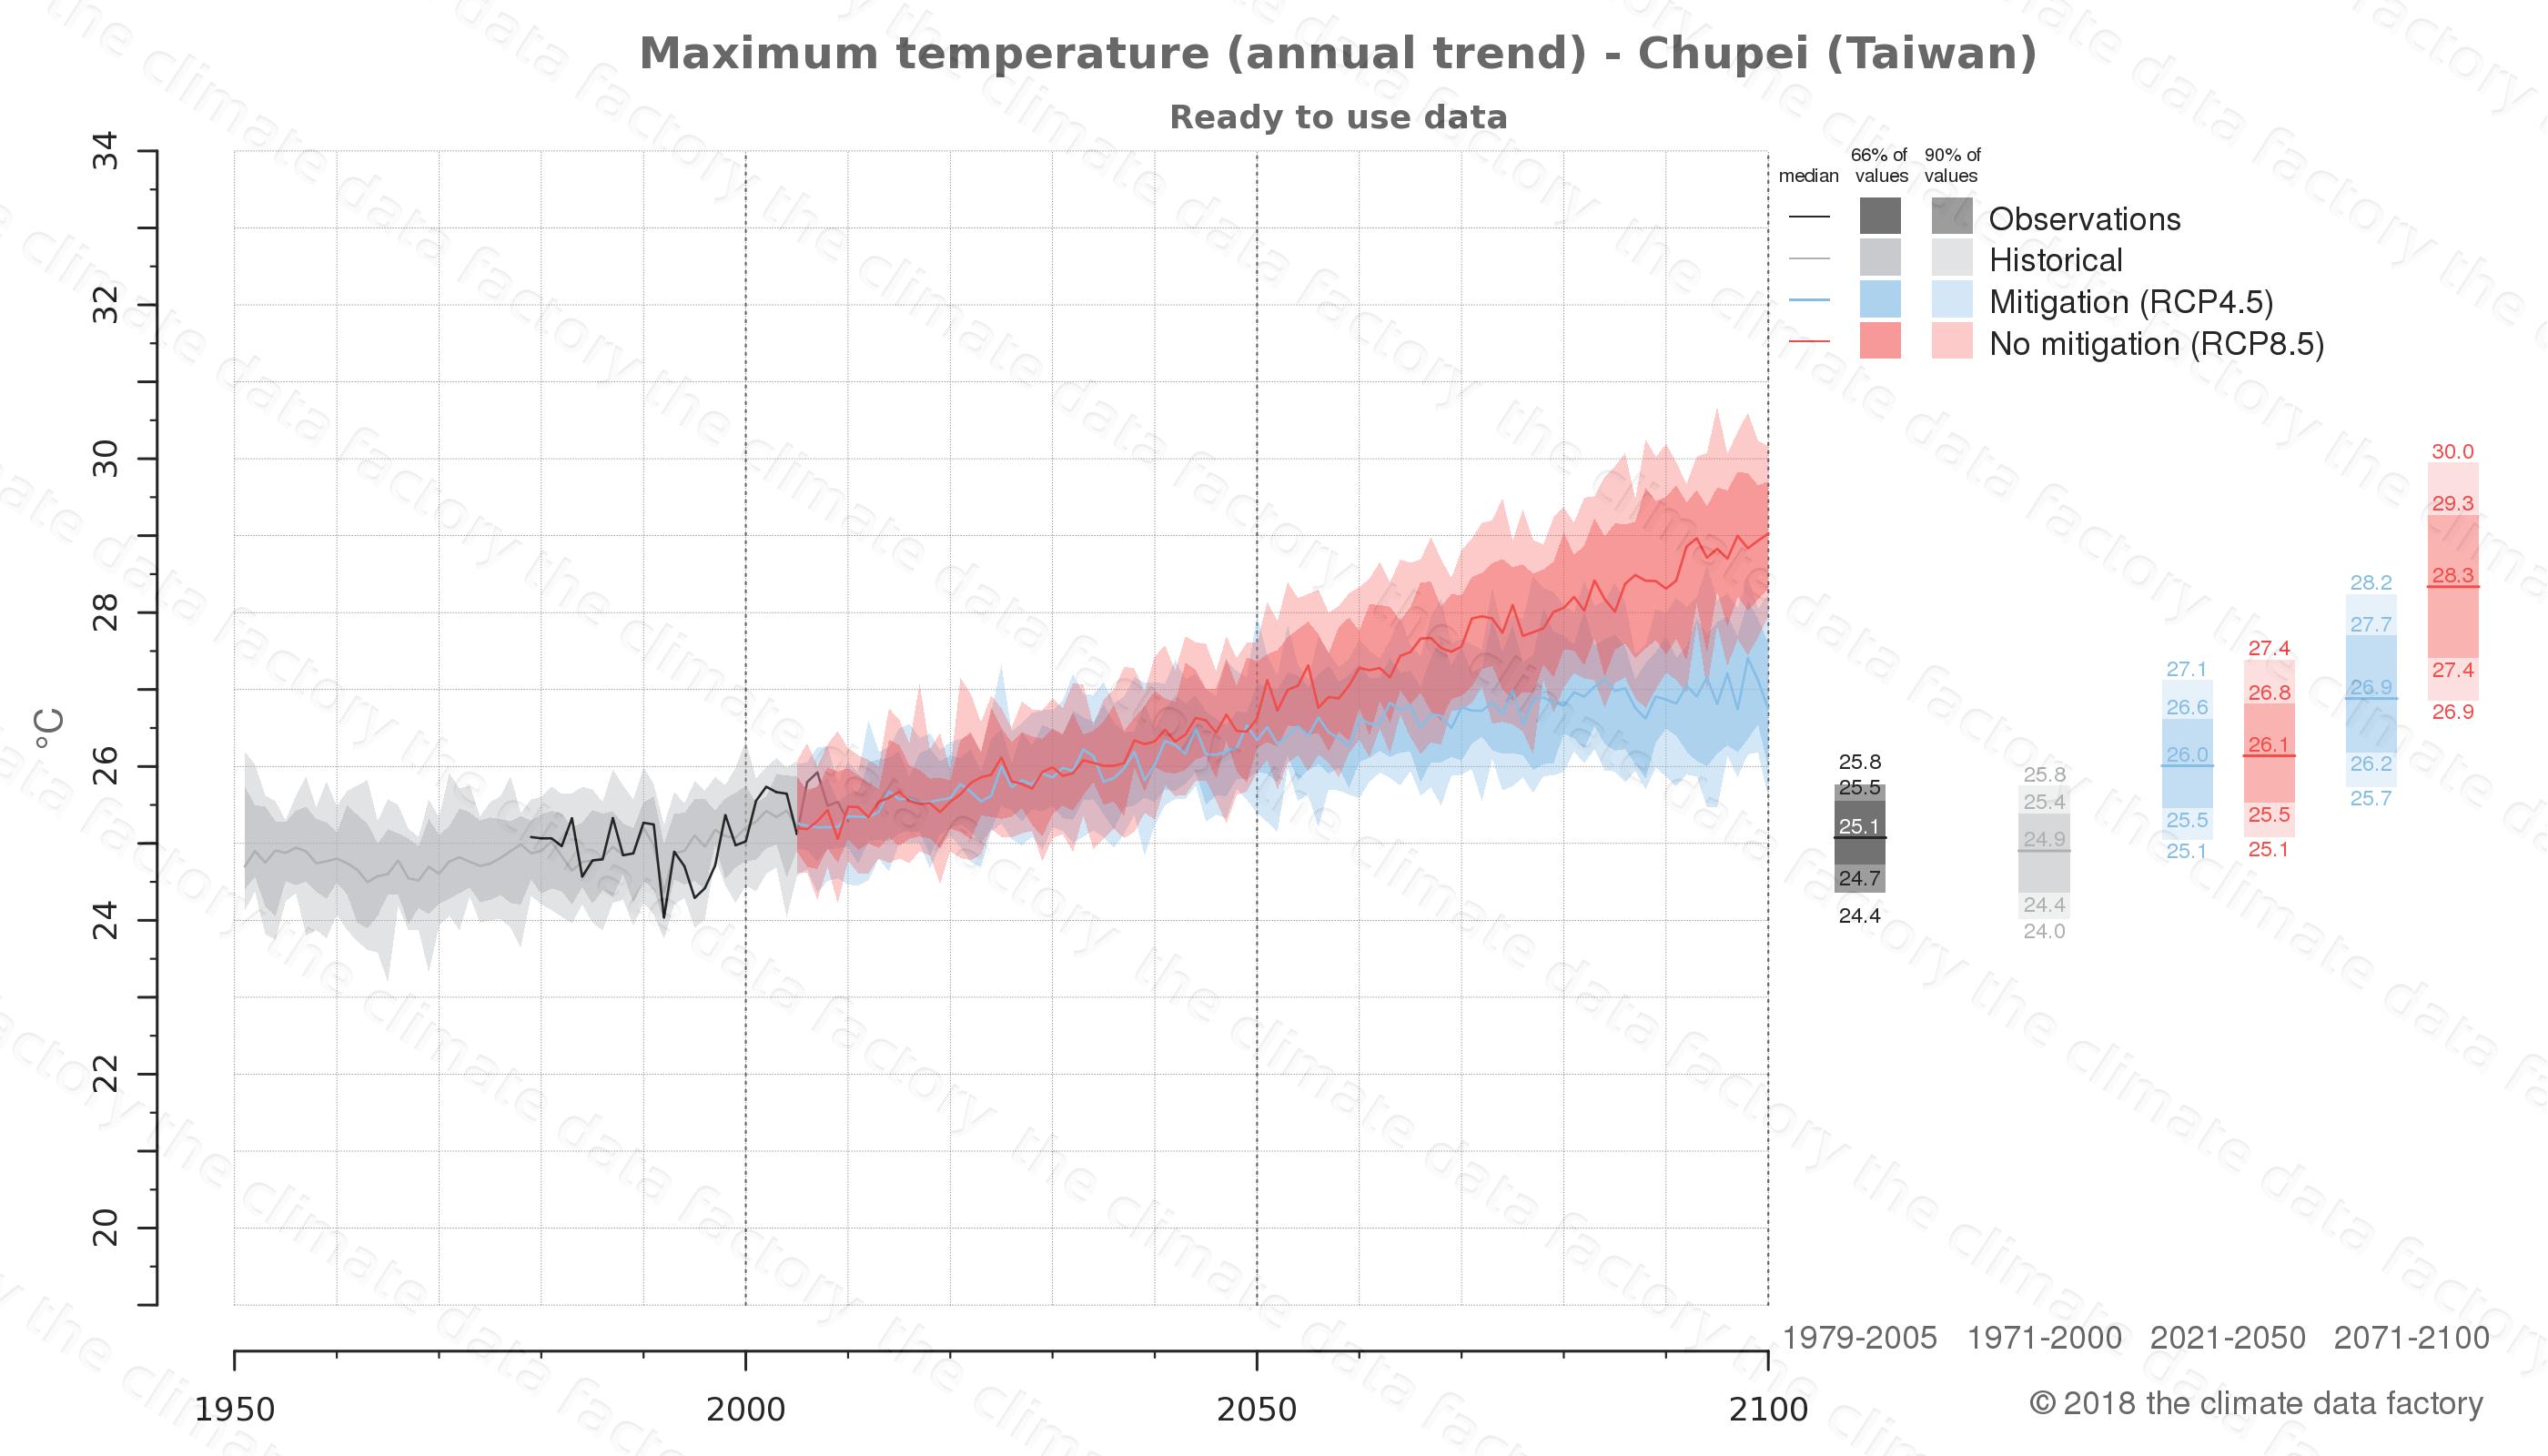 climate change data policy adaptation climate graph city data maximum-temperature chupei taiwan